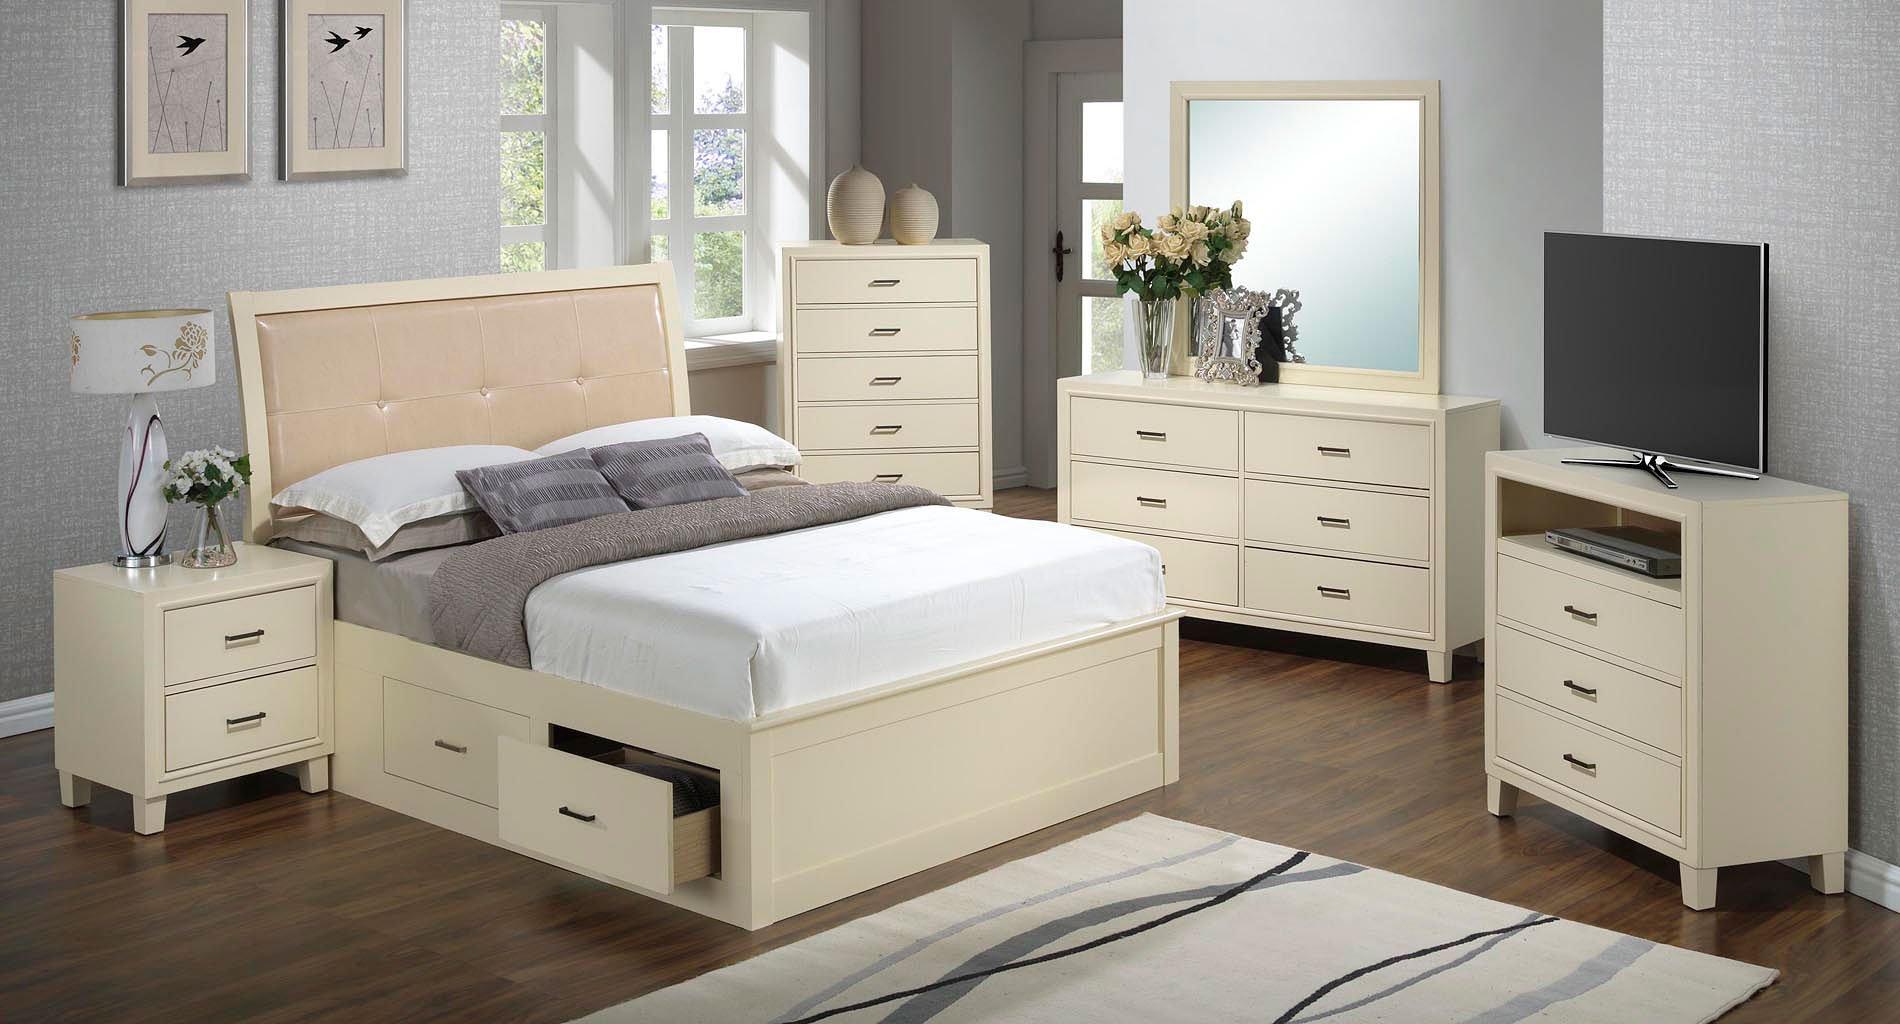 G1290 youth storage bedroom set glory furniture - Youth bedroom furniture with storage ...